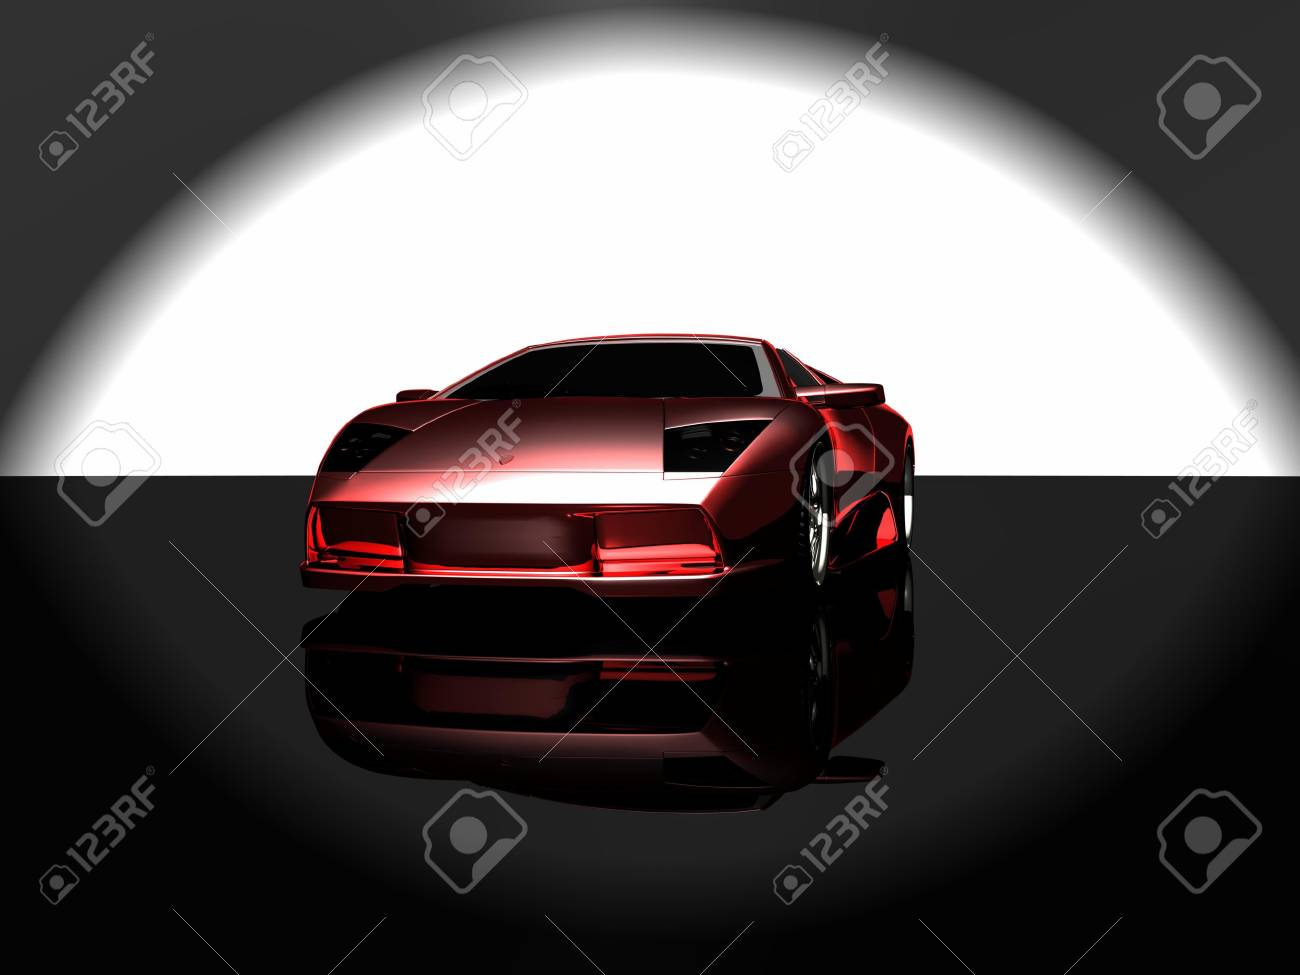 sports car Stock Photo - 4796746